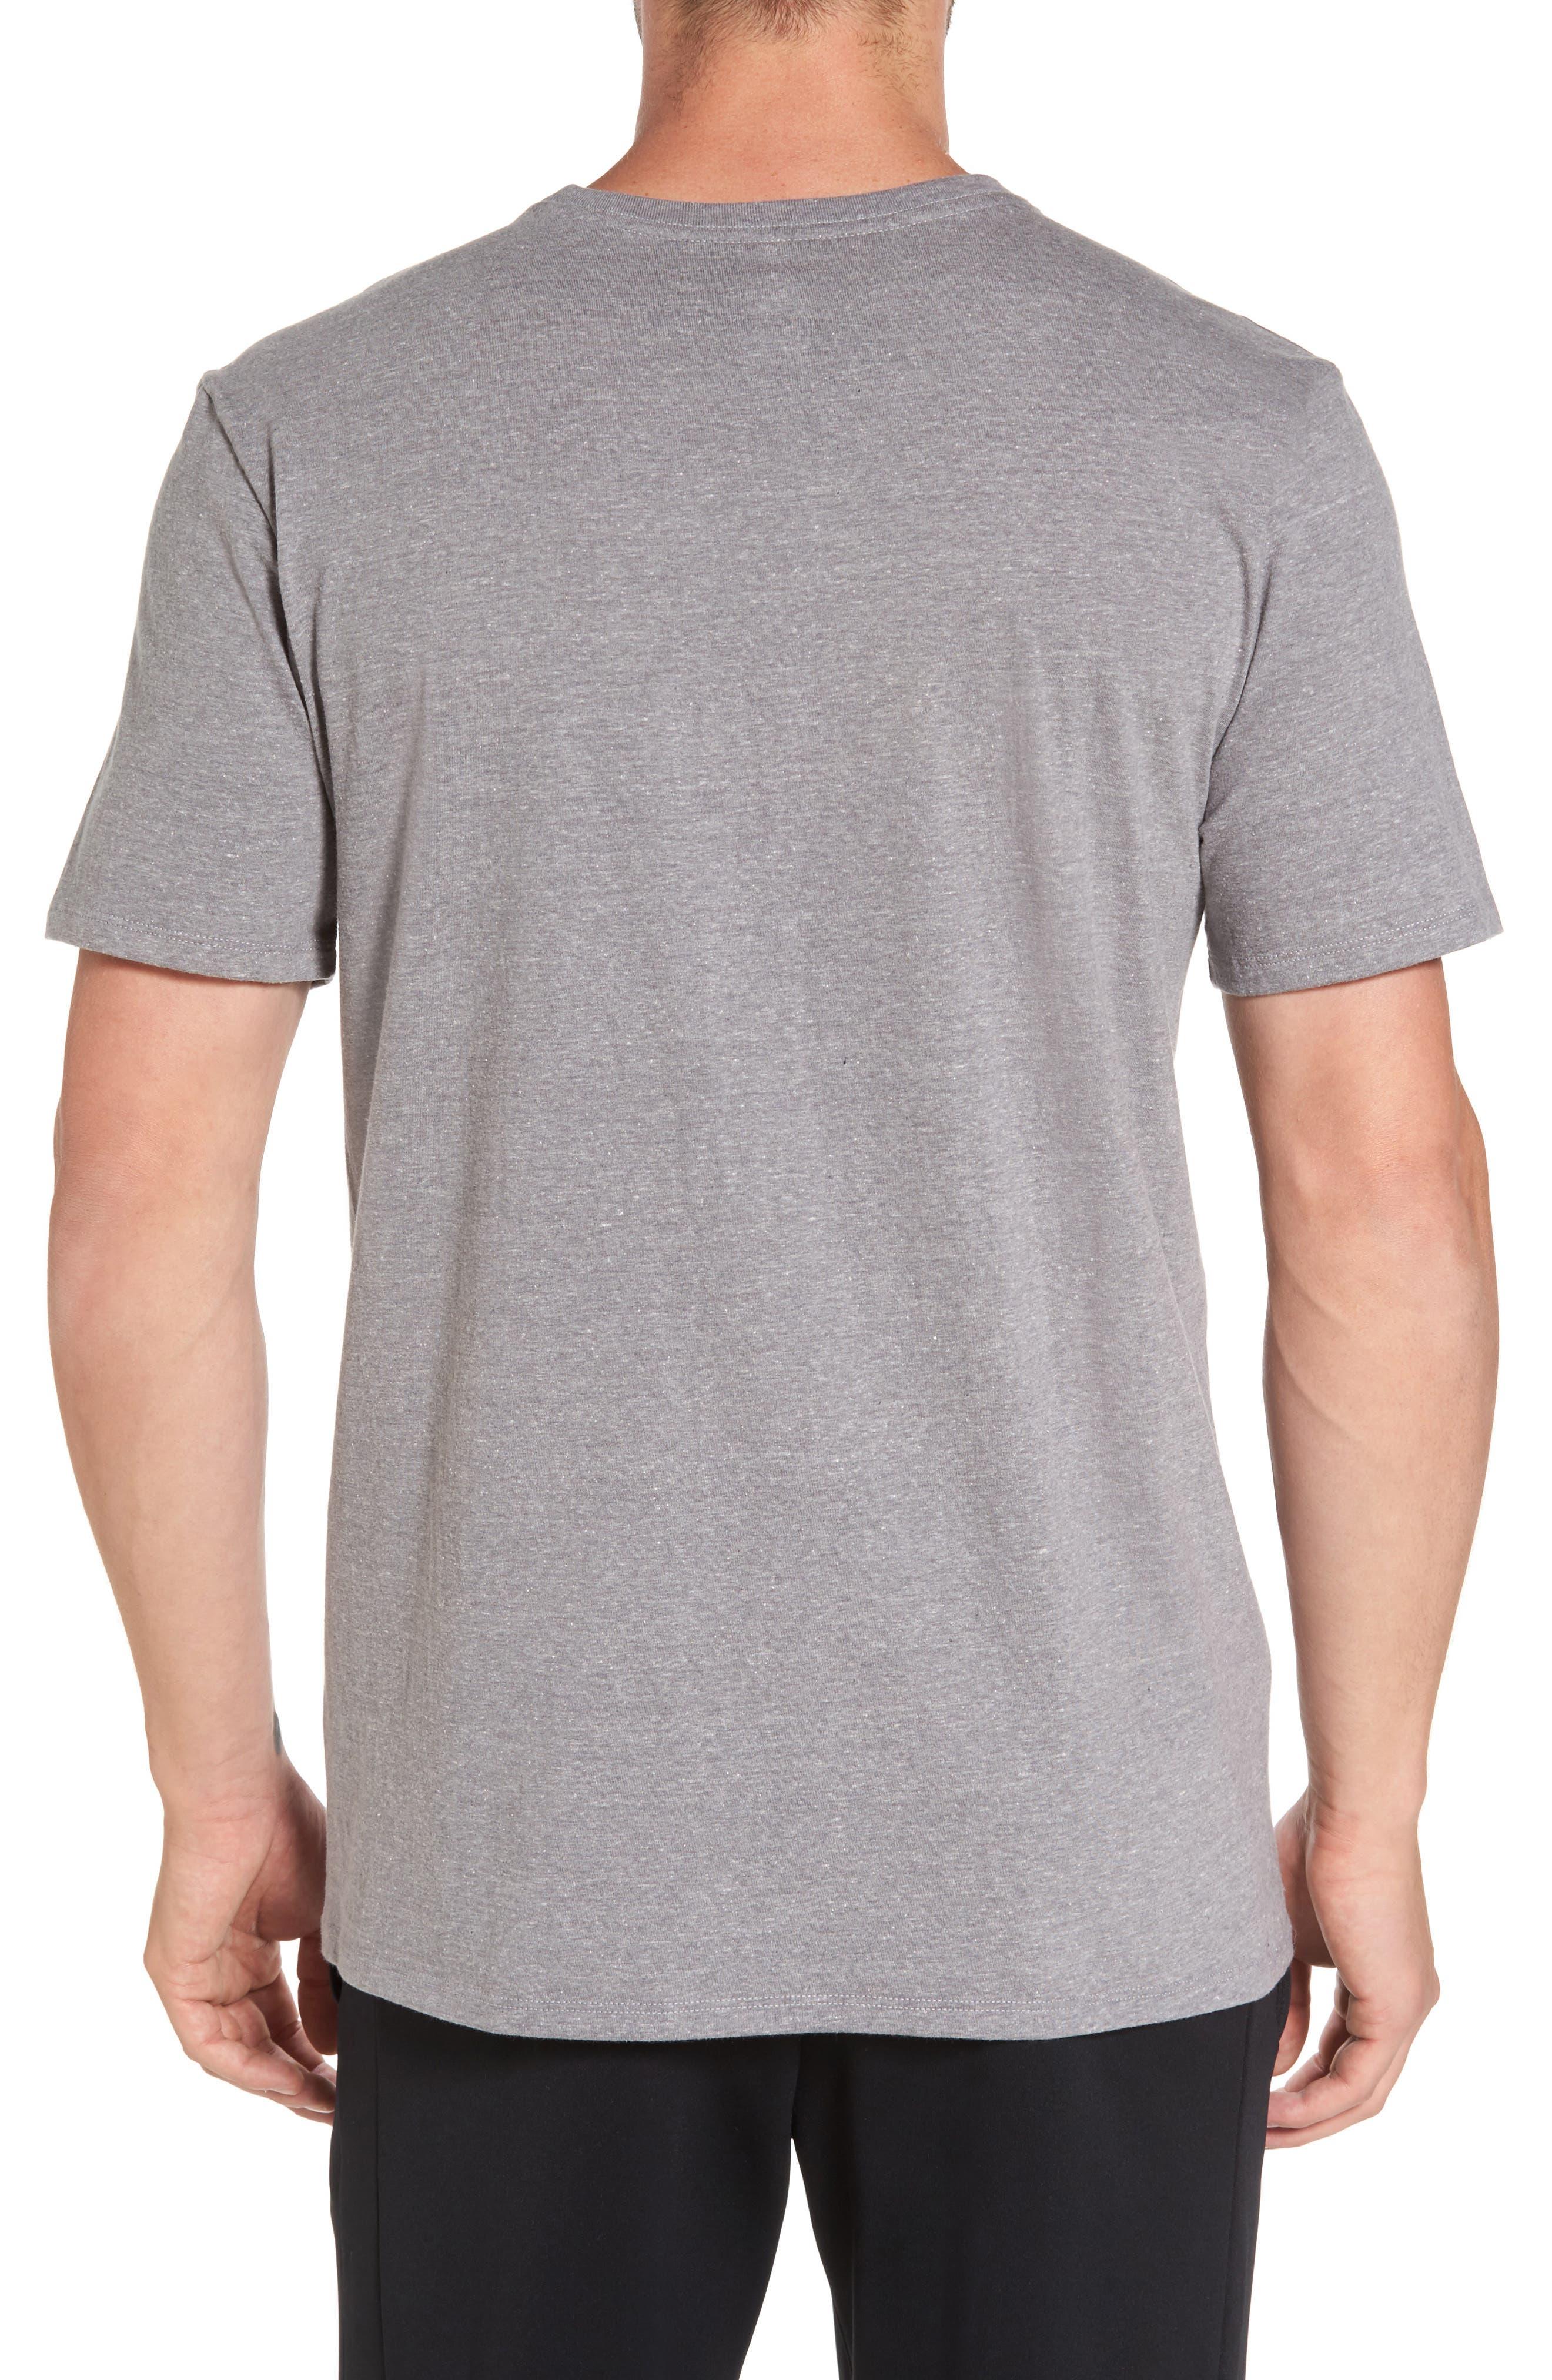 Sportswear Flight T-Shirt,                             Alternate thumbnail 2, color,                             091